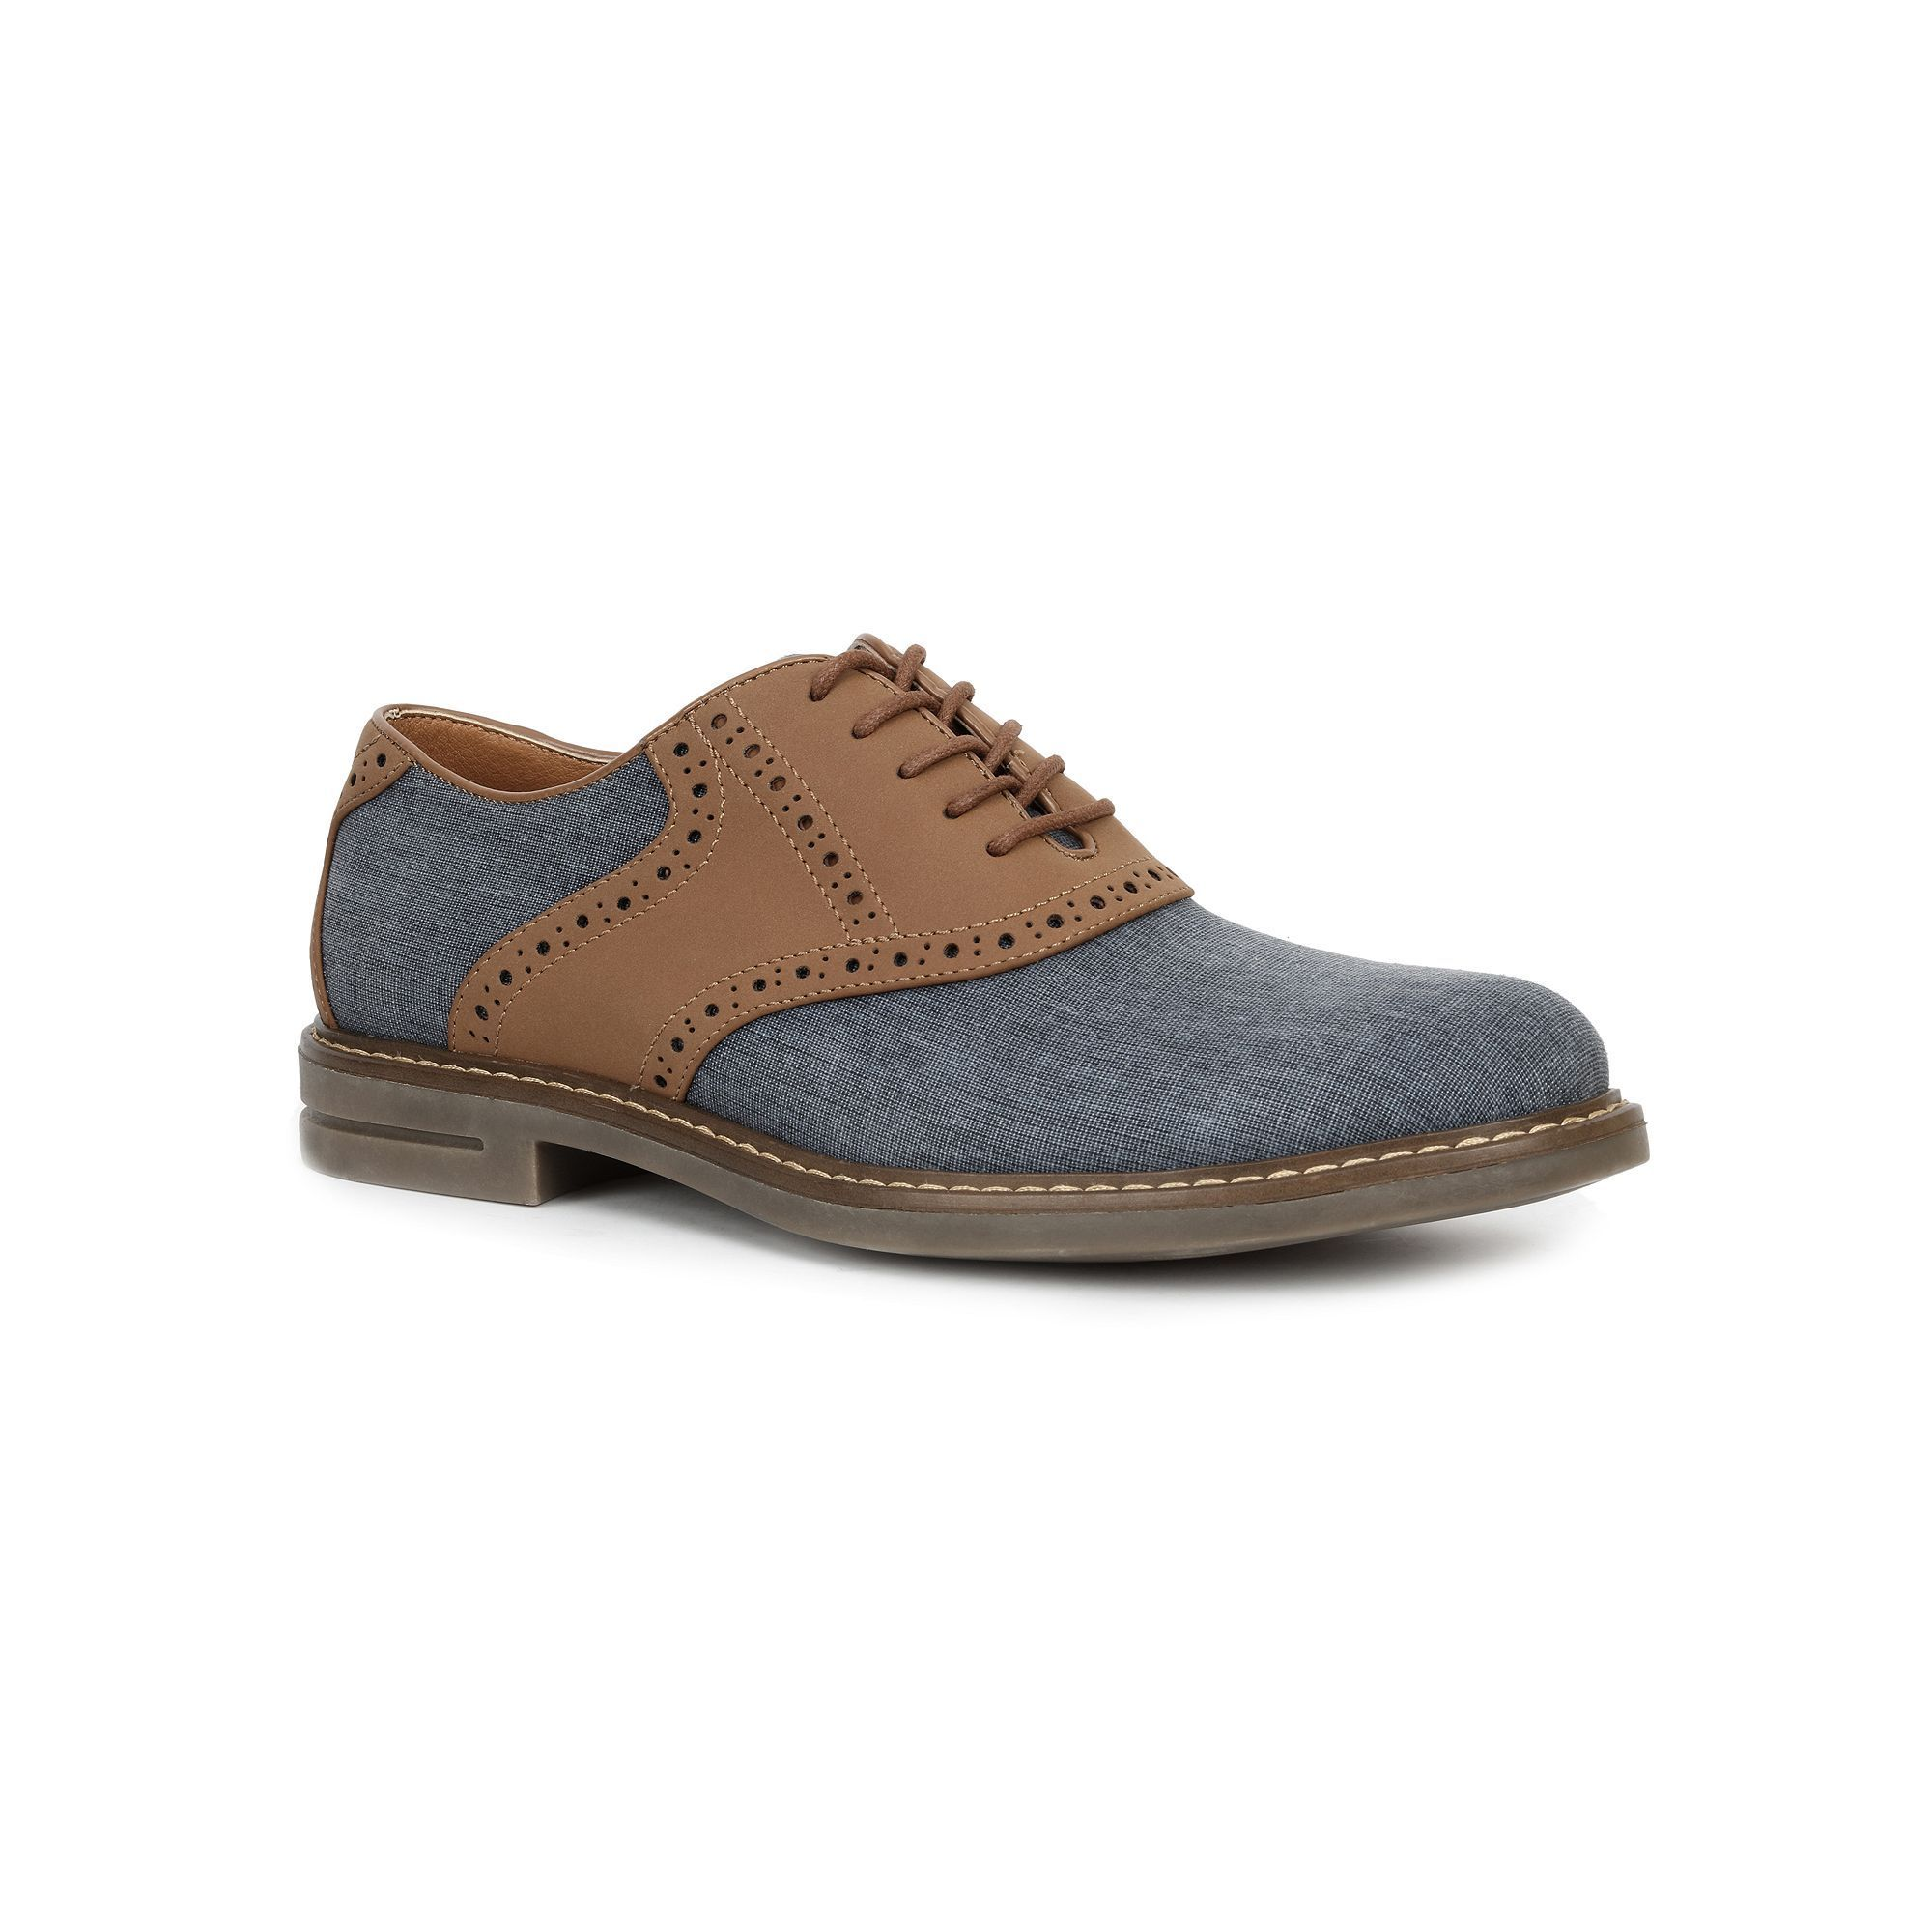 IZOD Conaway Men's Saddle Oxford Shoes, Size: medium (12), Red/Coppr  (Rust/Coppr)